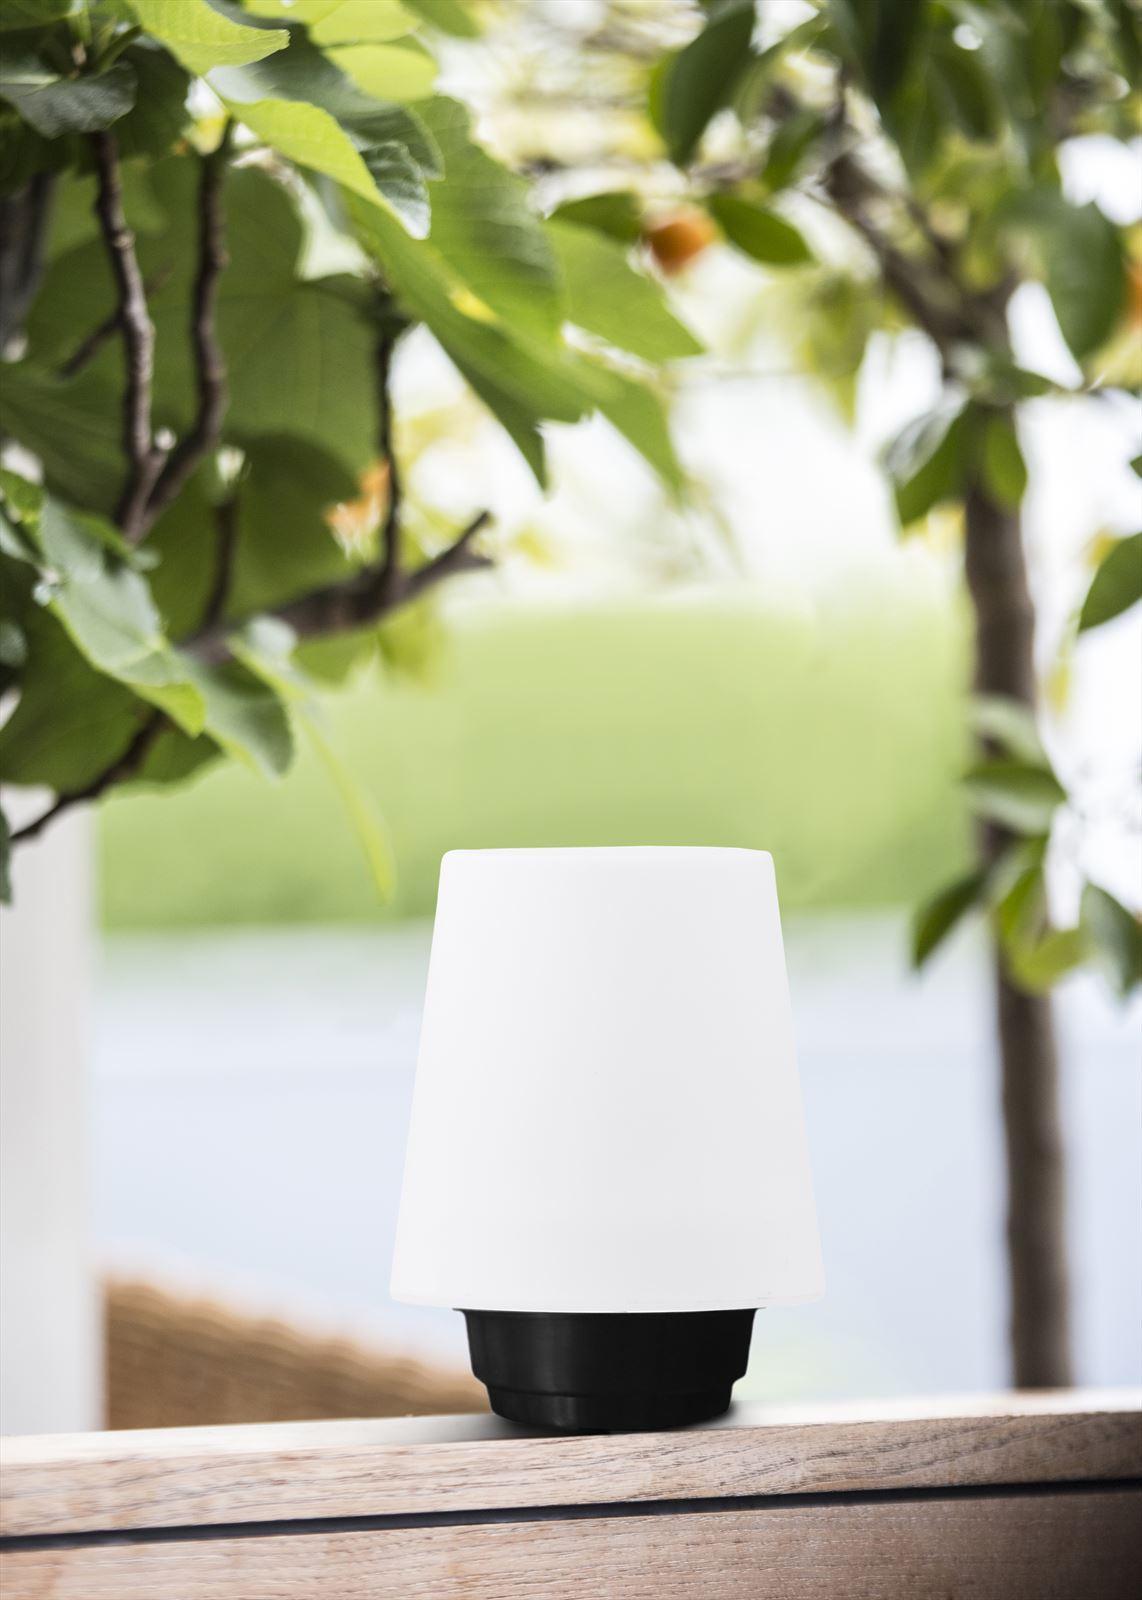 Gacoli tuinlampen Gacoli tuinlamp Checkmate No.1 DOCK, diameter 12 cm